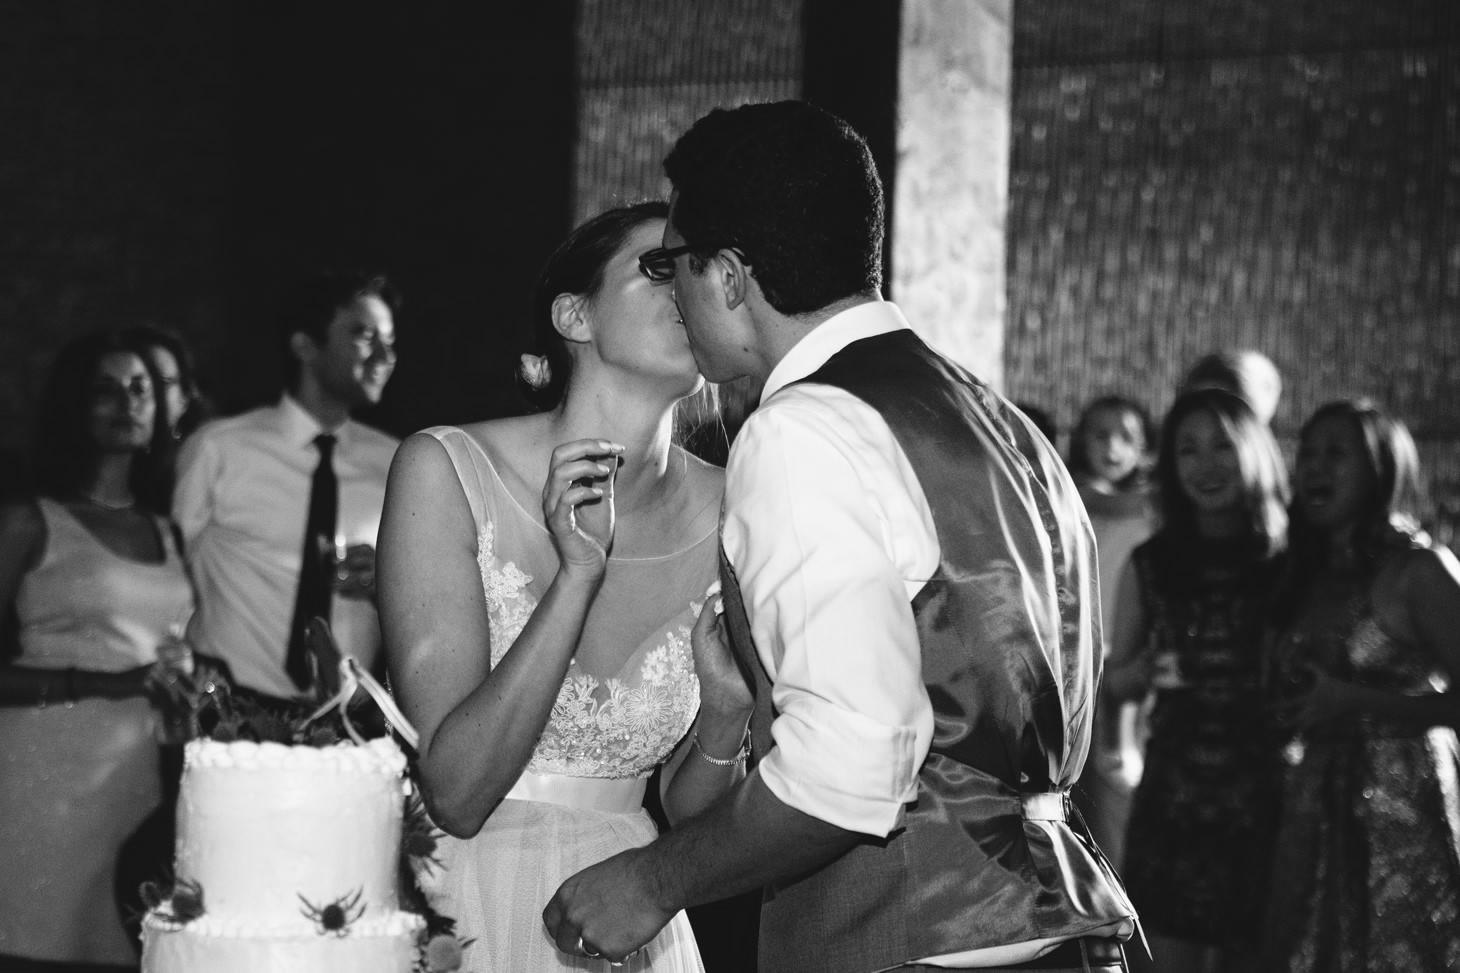 047-nyc-dumbo-loft-brooklyn-wedding-photographer-smitten-chickens-photo-.jpg